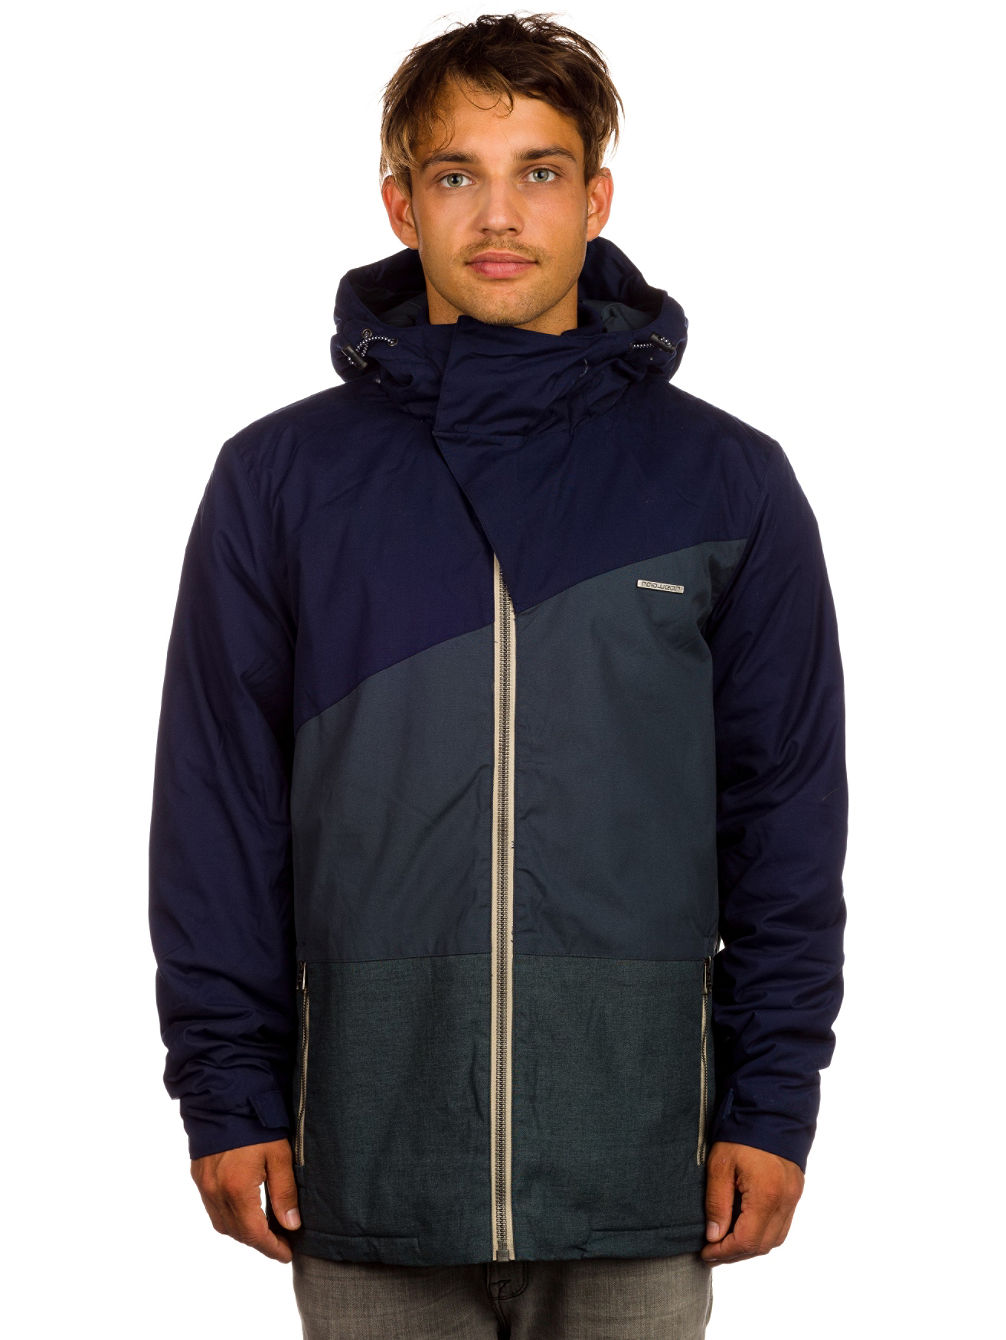 ragwear-jacket